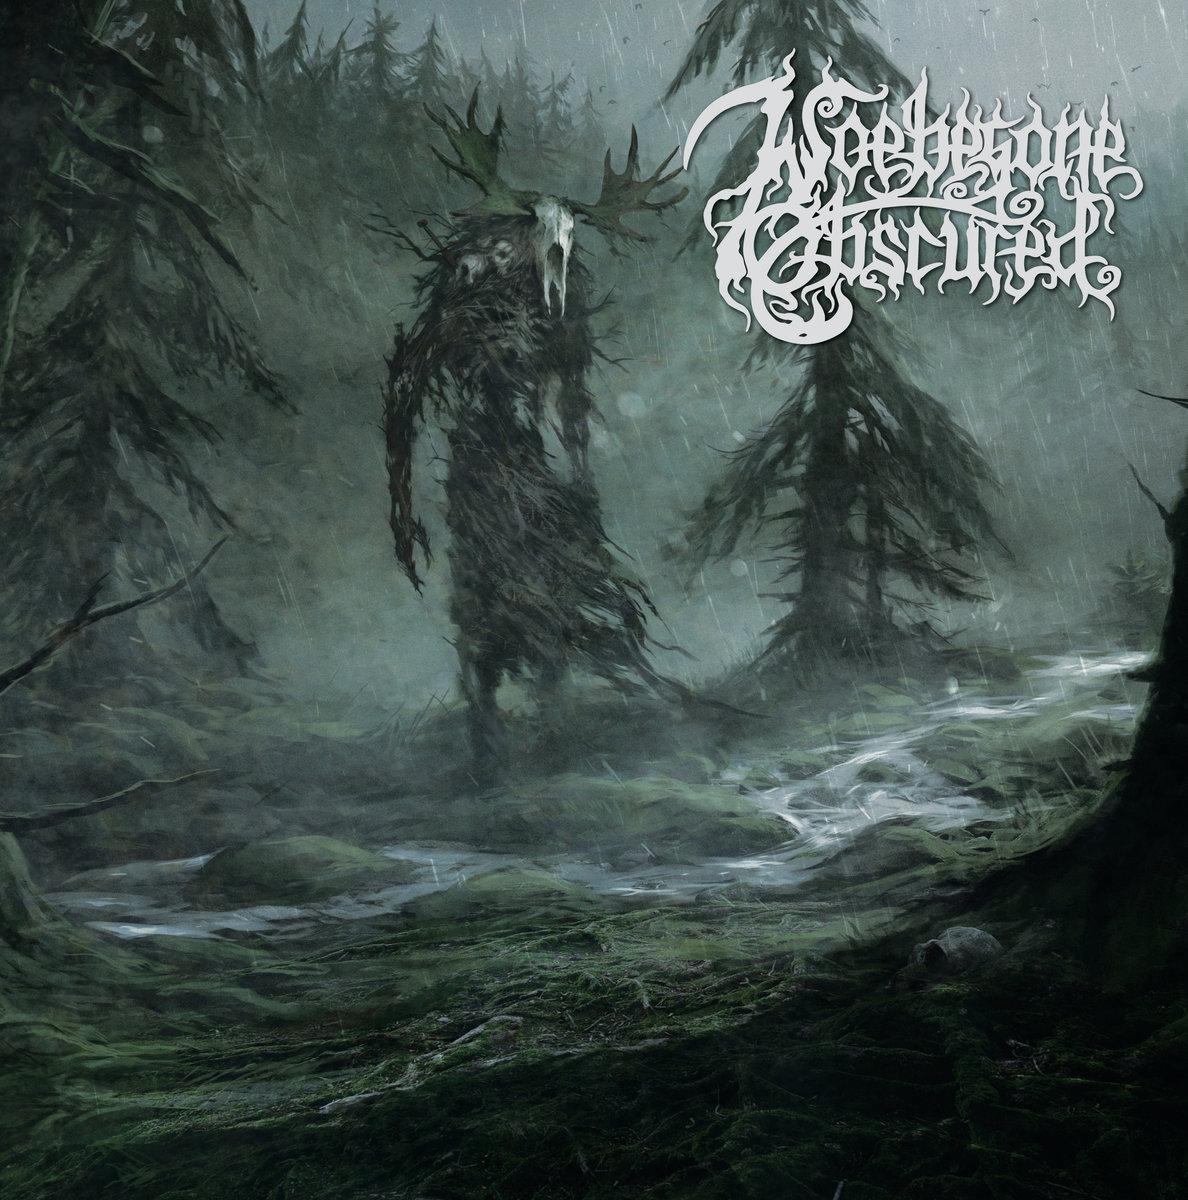 Woebegone Obscured - The Forestroamer LP